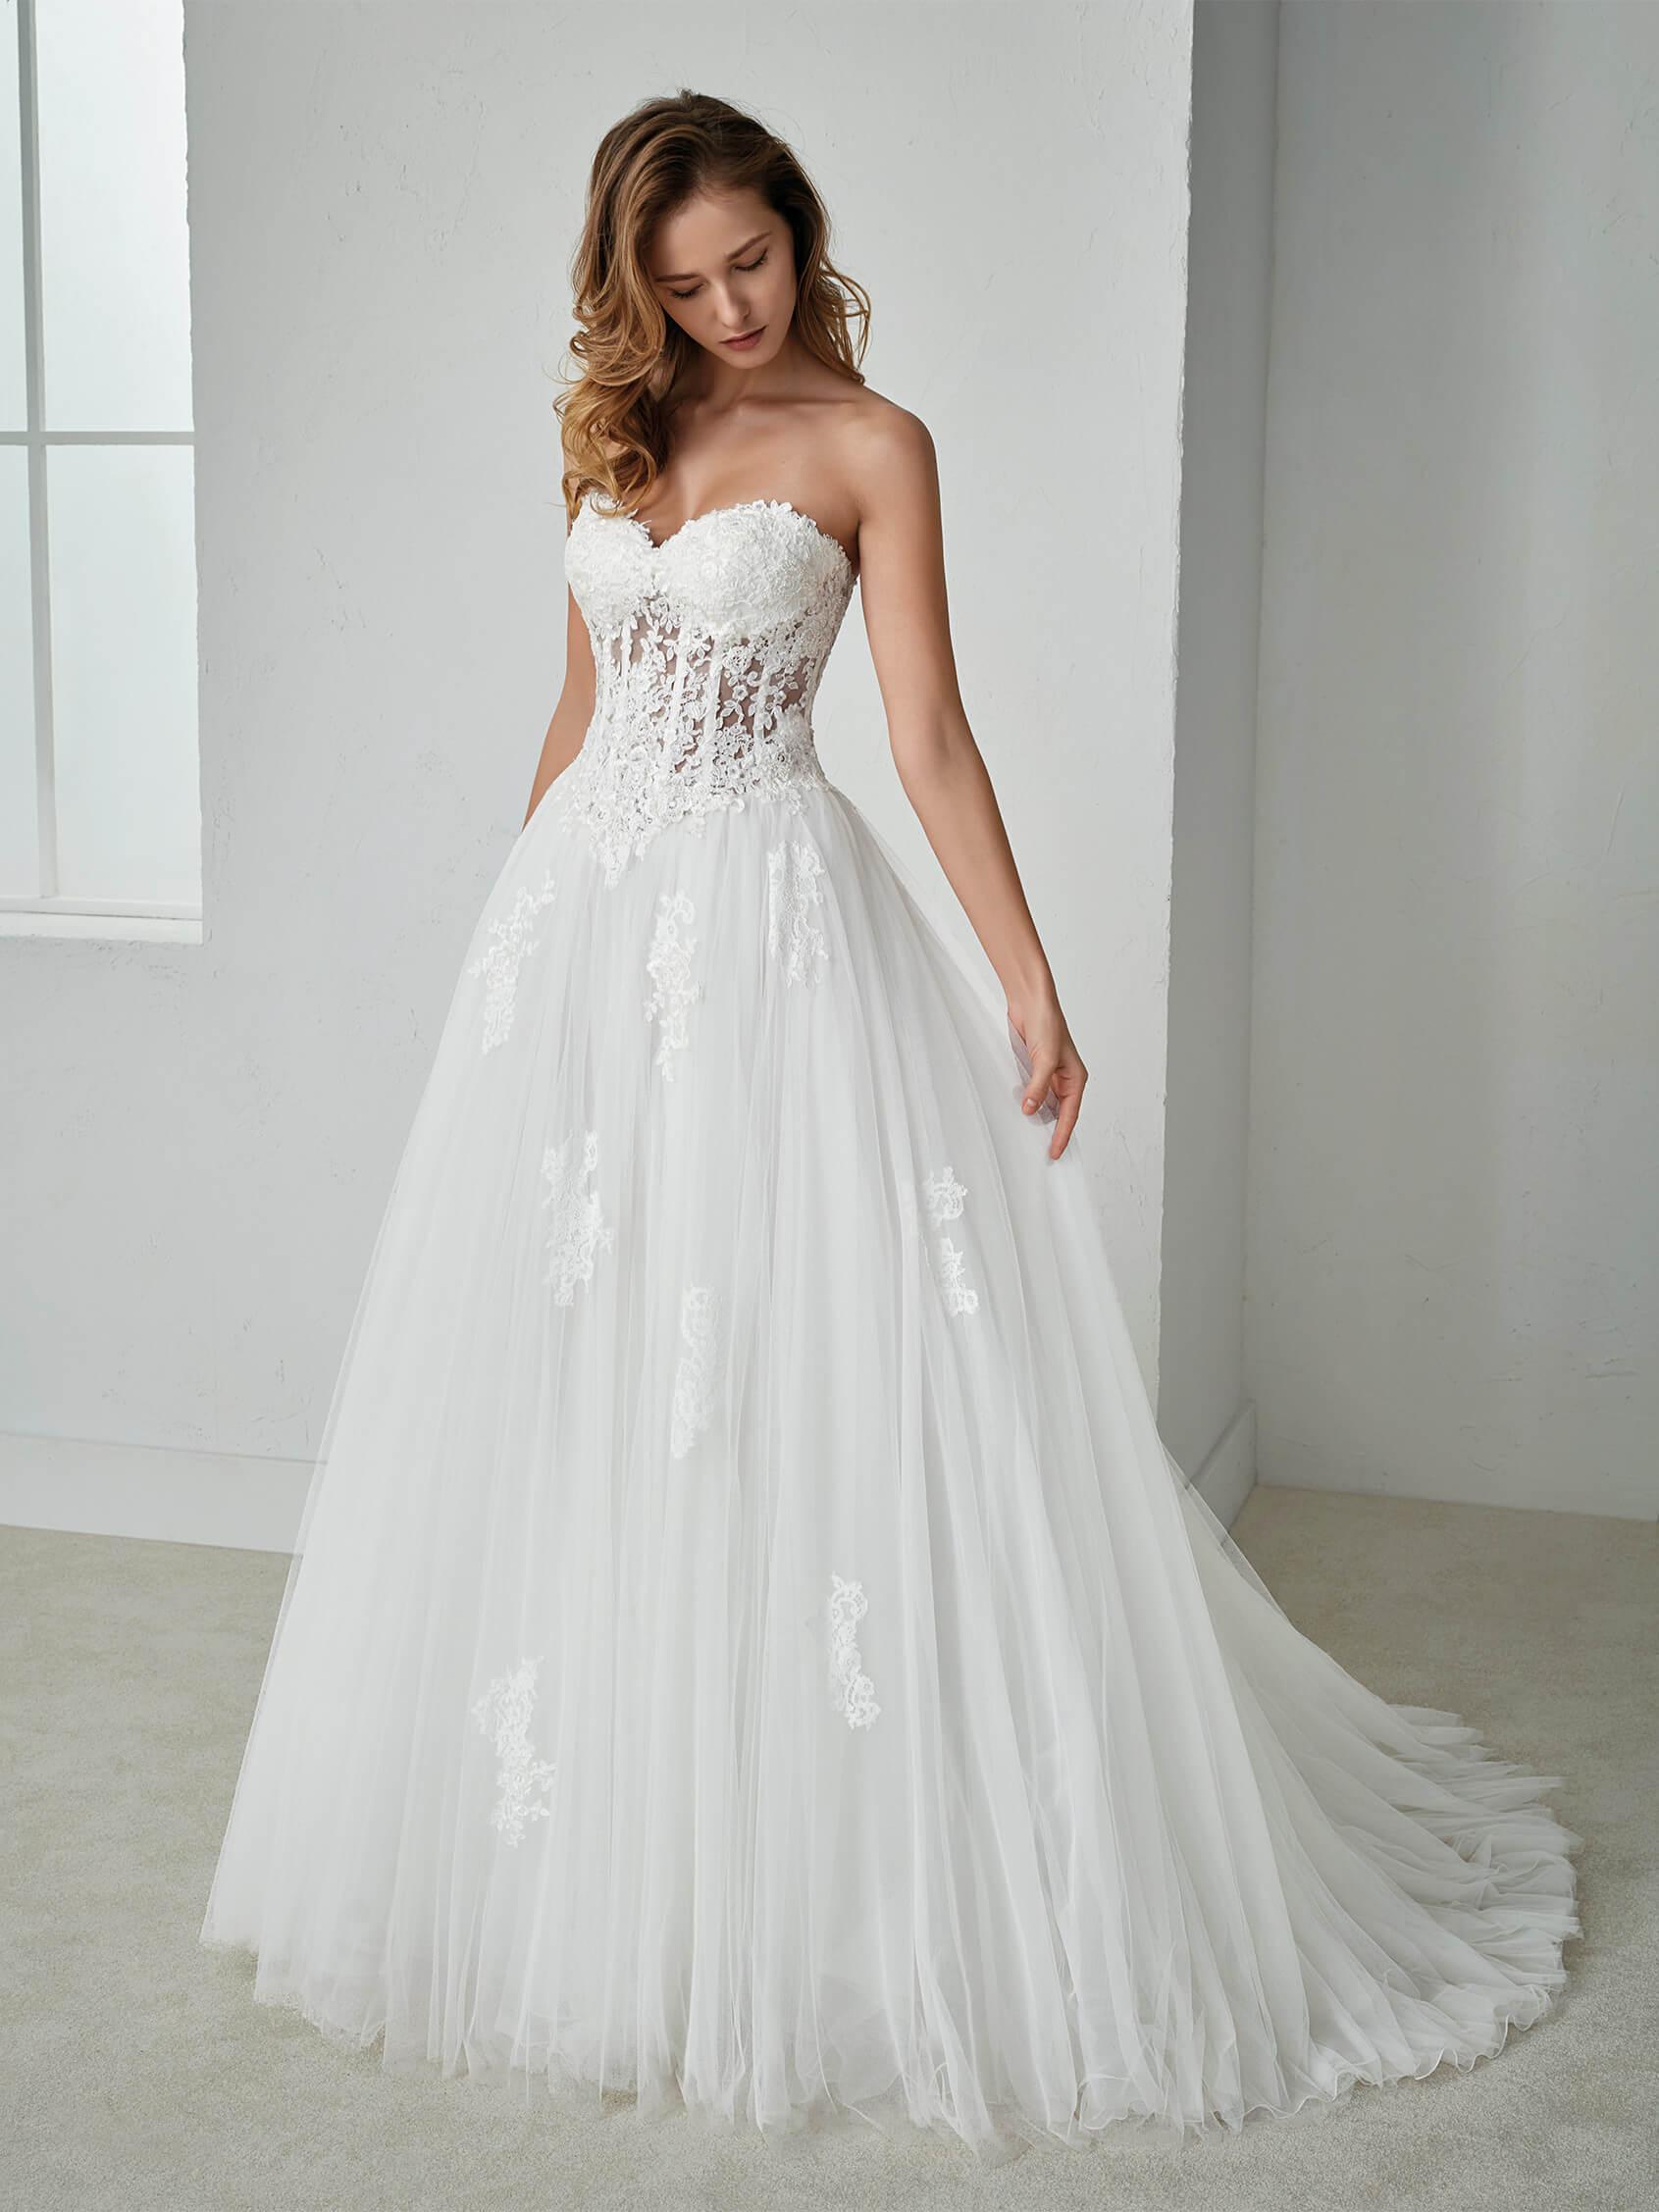 Elegant Wedding Dresses Sale : Serena Bridal